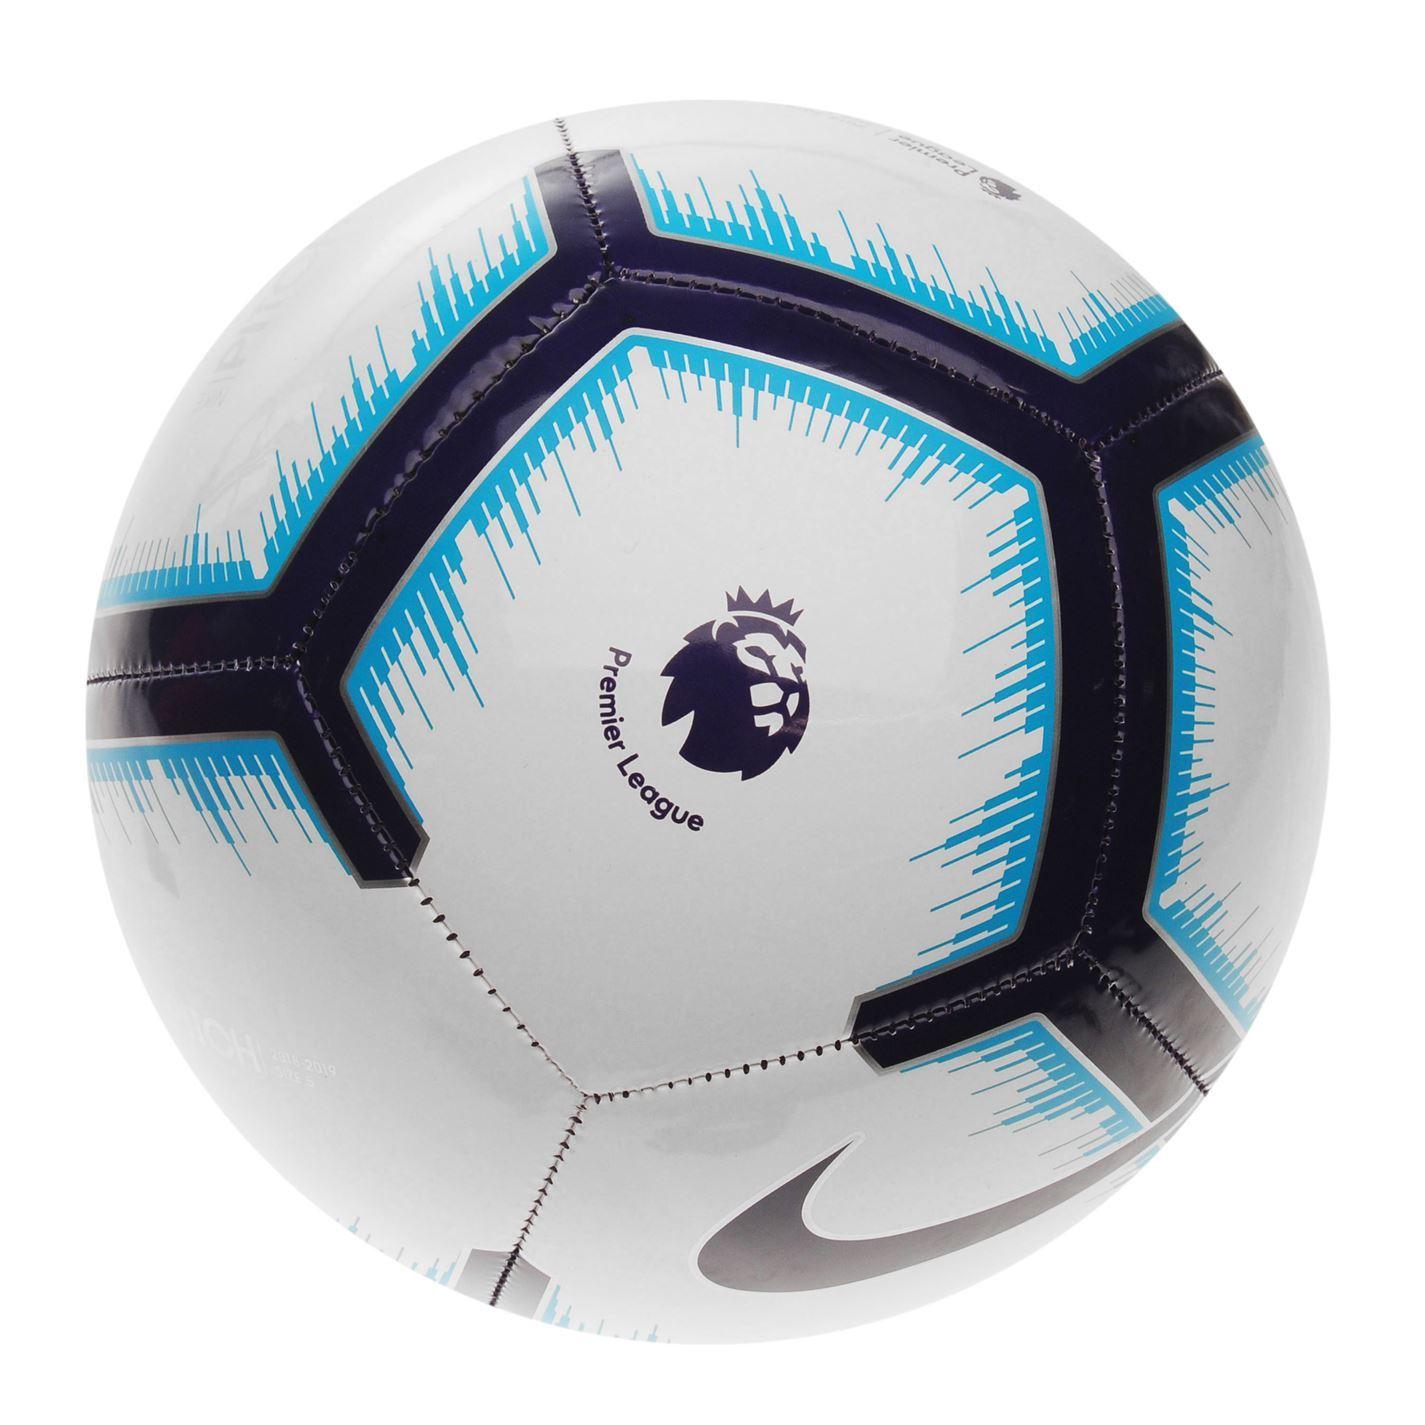 bb2128f2b Nike-Pitch-Premier-League-Football-Soccer-Ball thumbnail 10